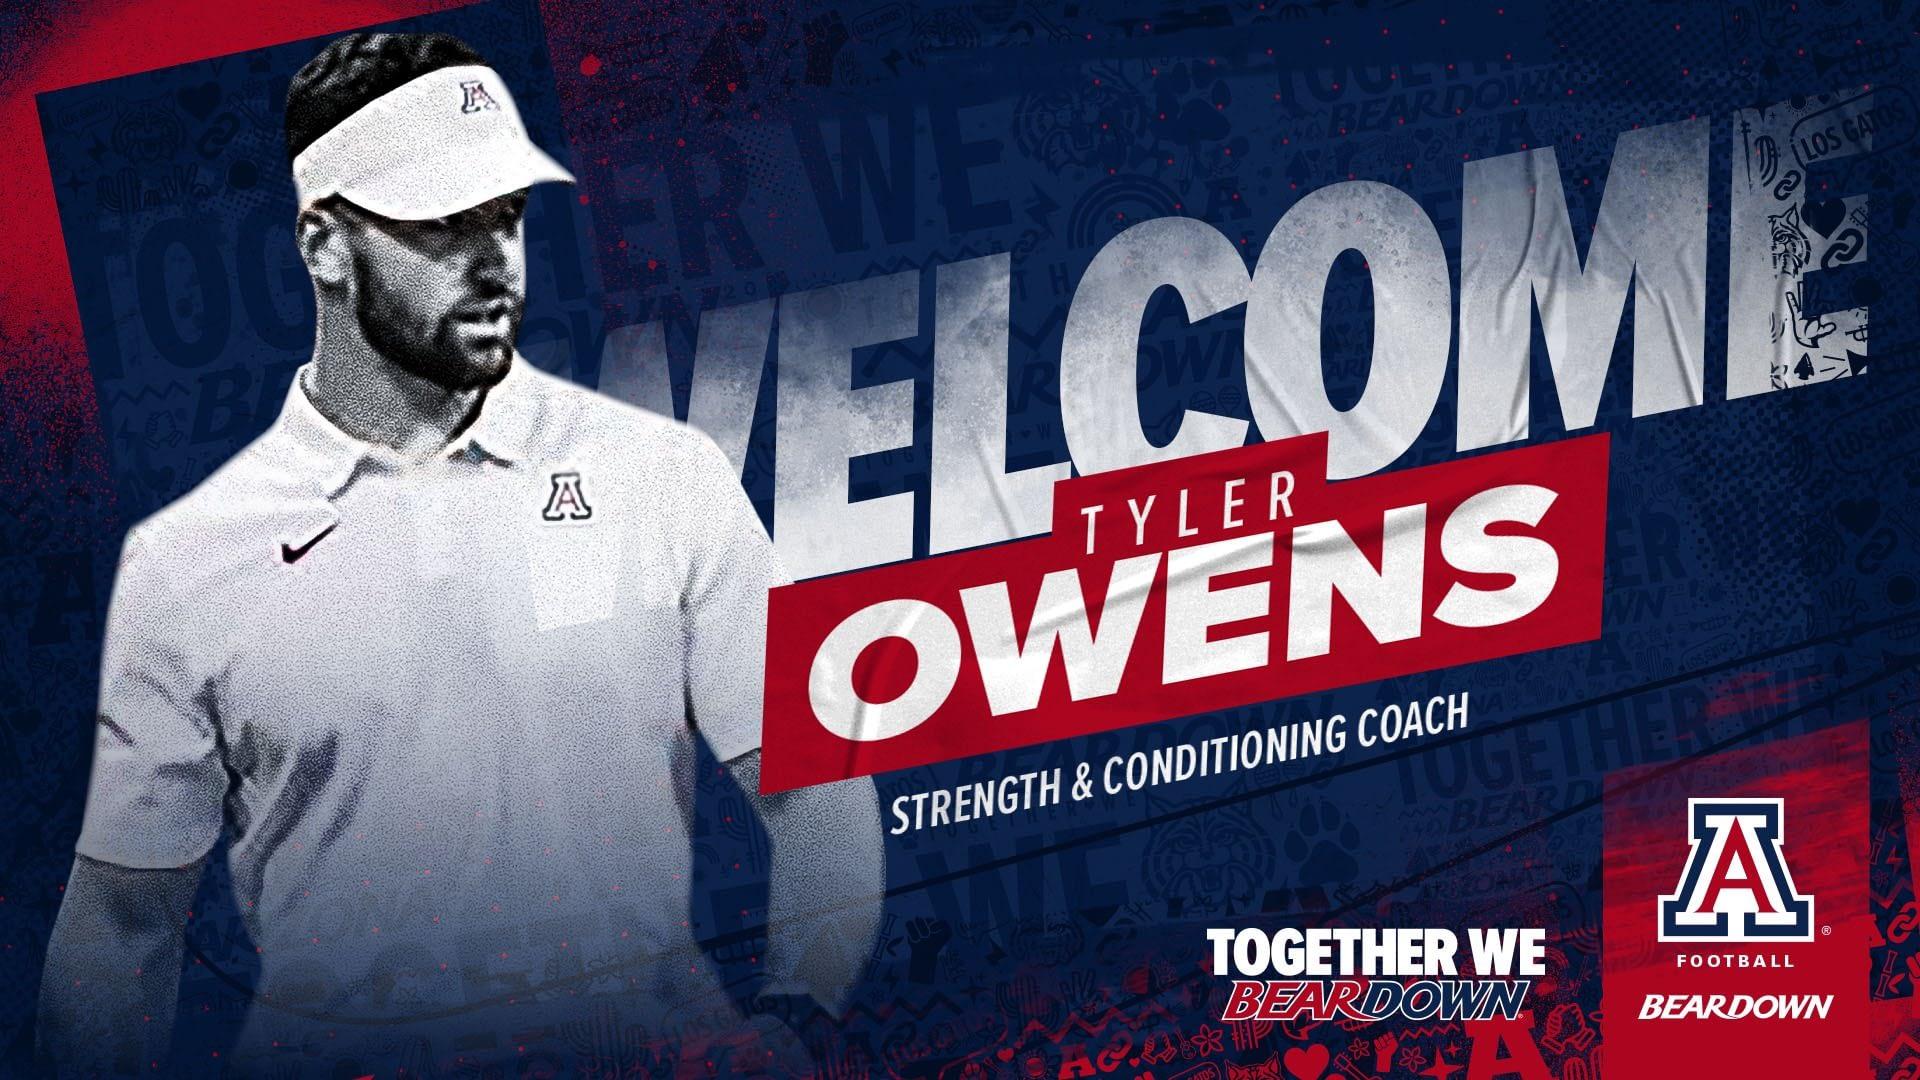 Tyler-Owens